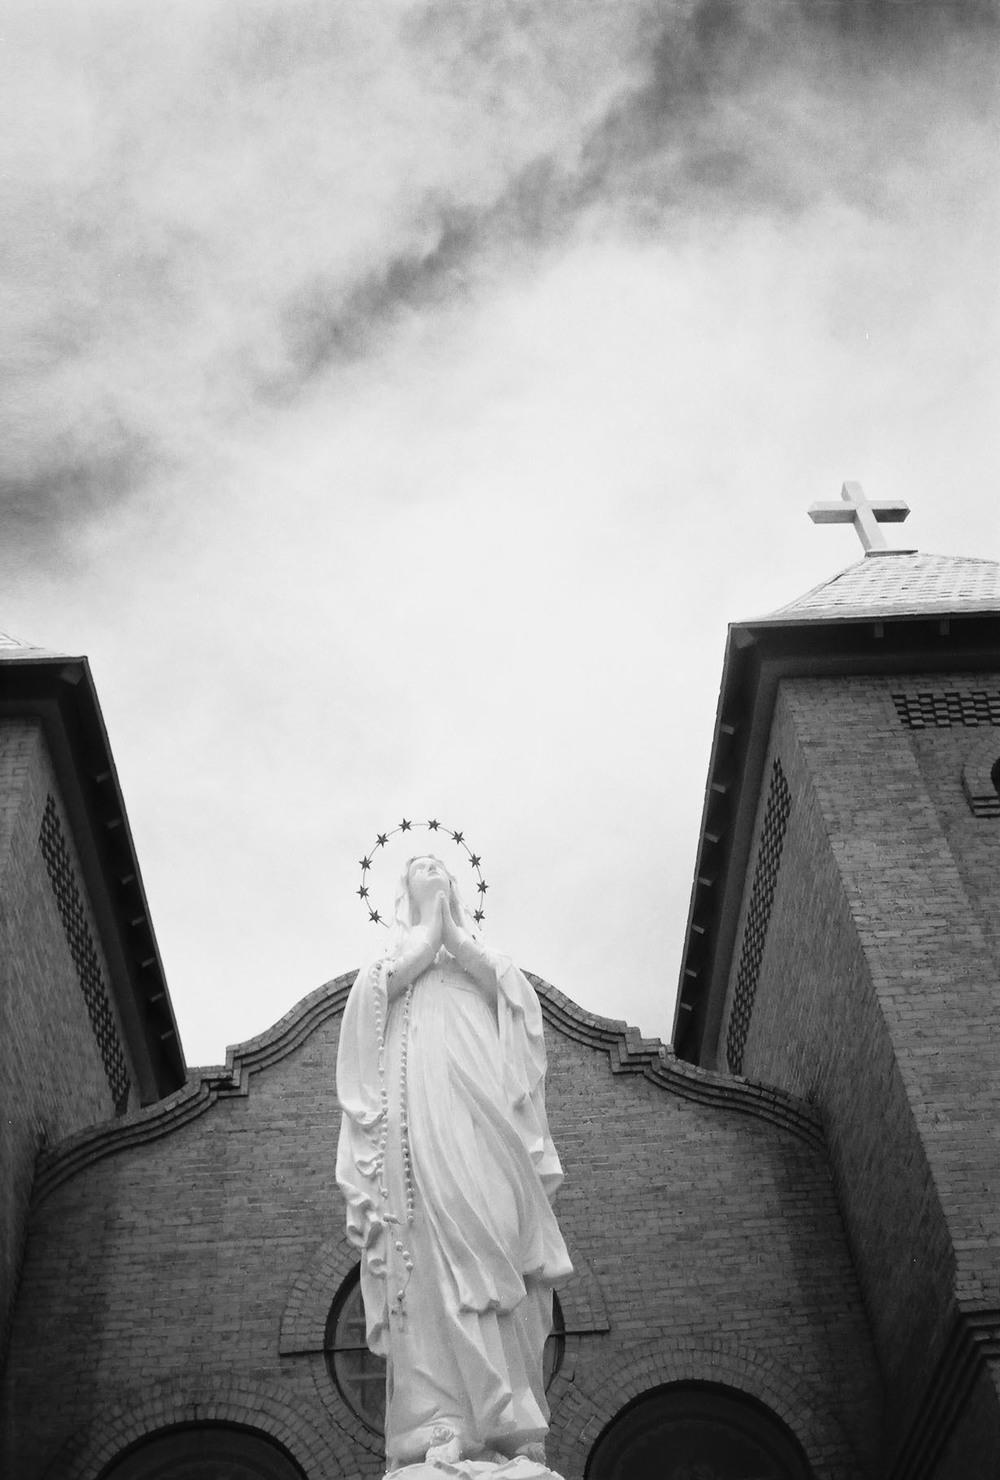 casenruiz-church-new-mexico-1-bw.jpg